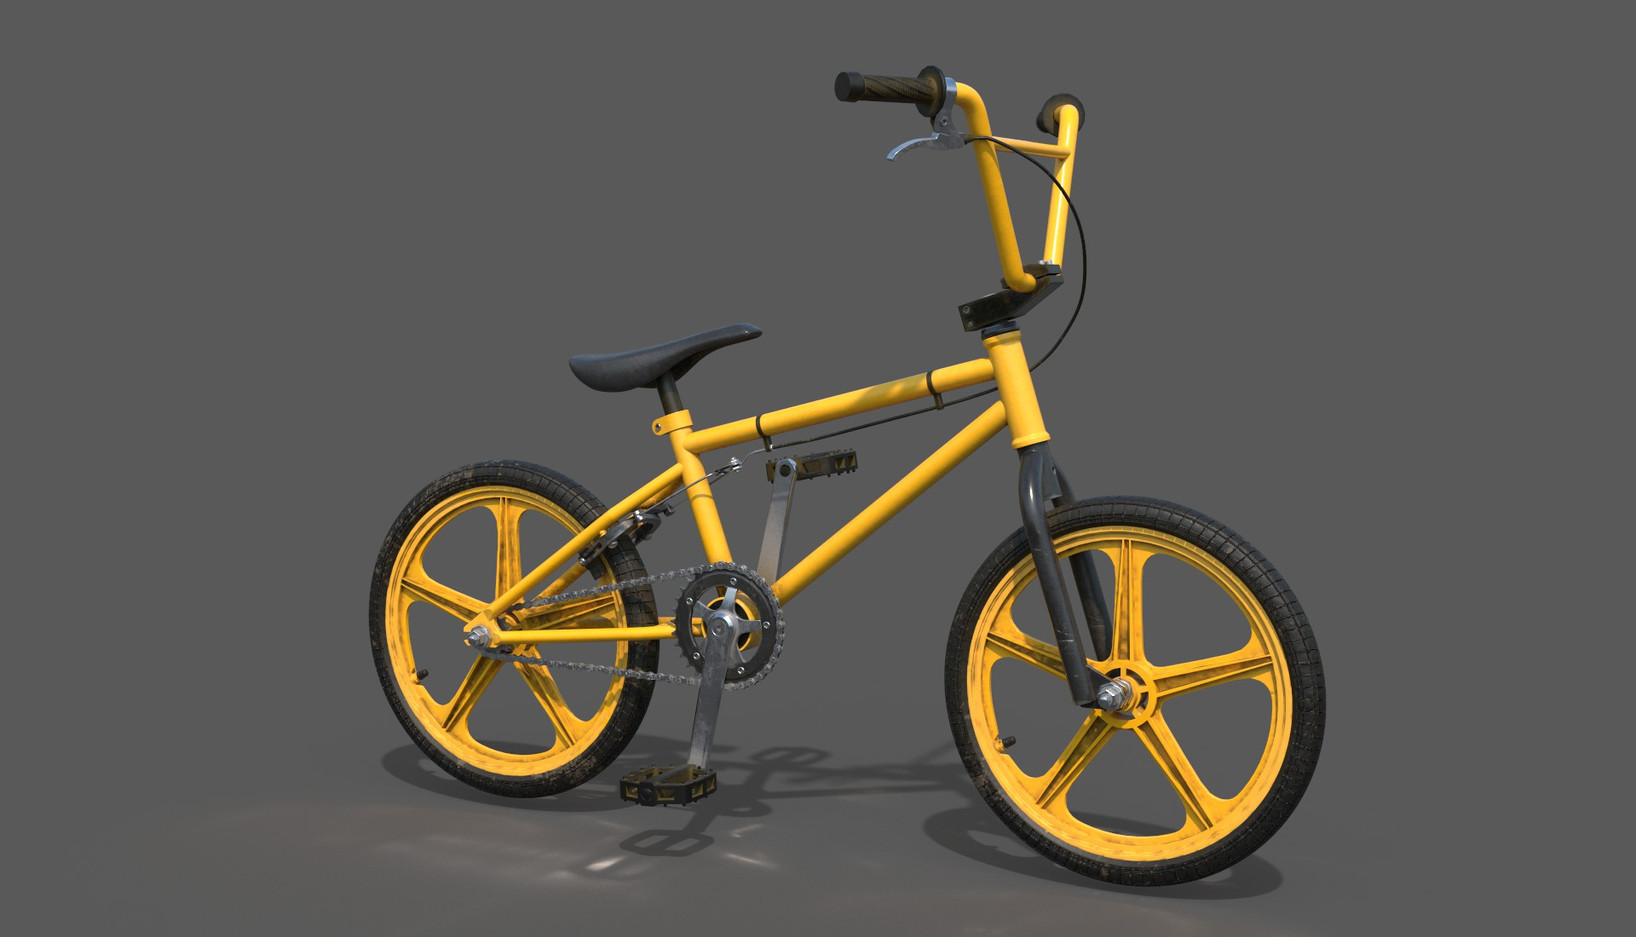 BMX Bike_Full Image